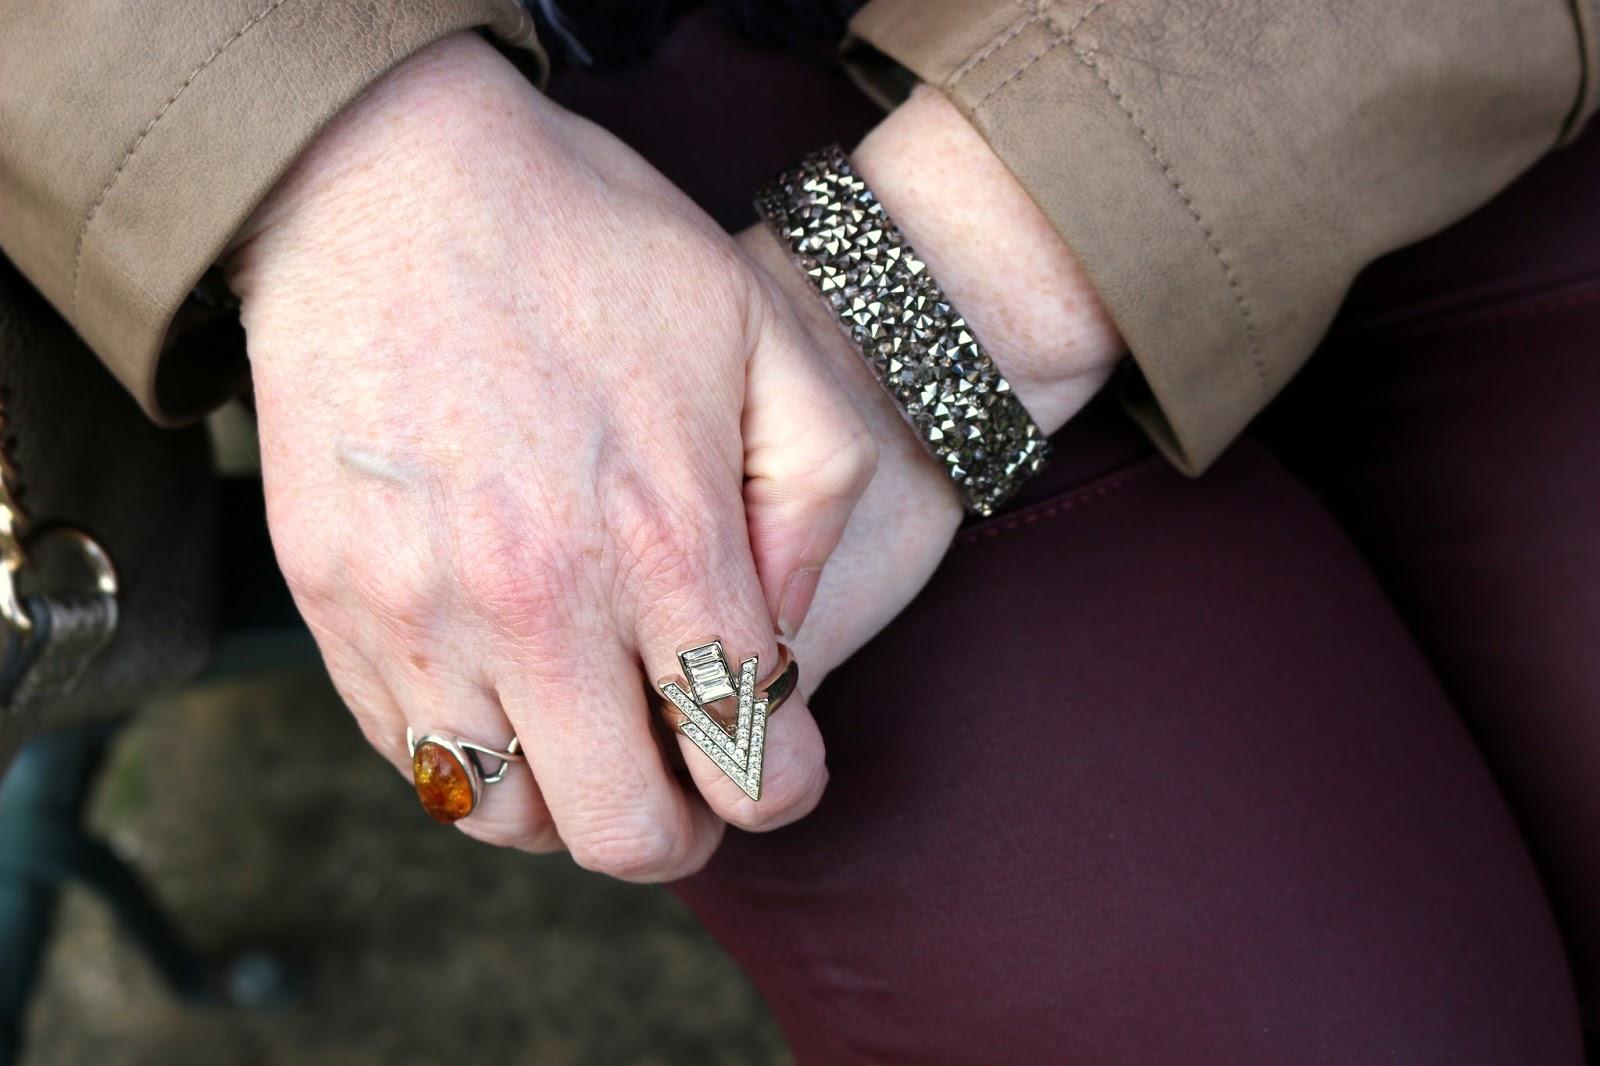 Stylish Look on a Budget; Glittery Bracelet, Arrow Ring | Petite Silver Vixen, over 40 style